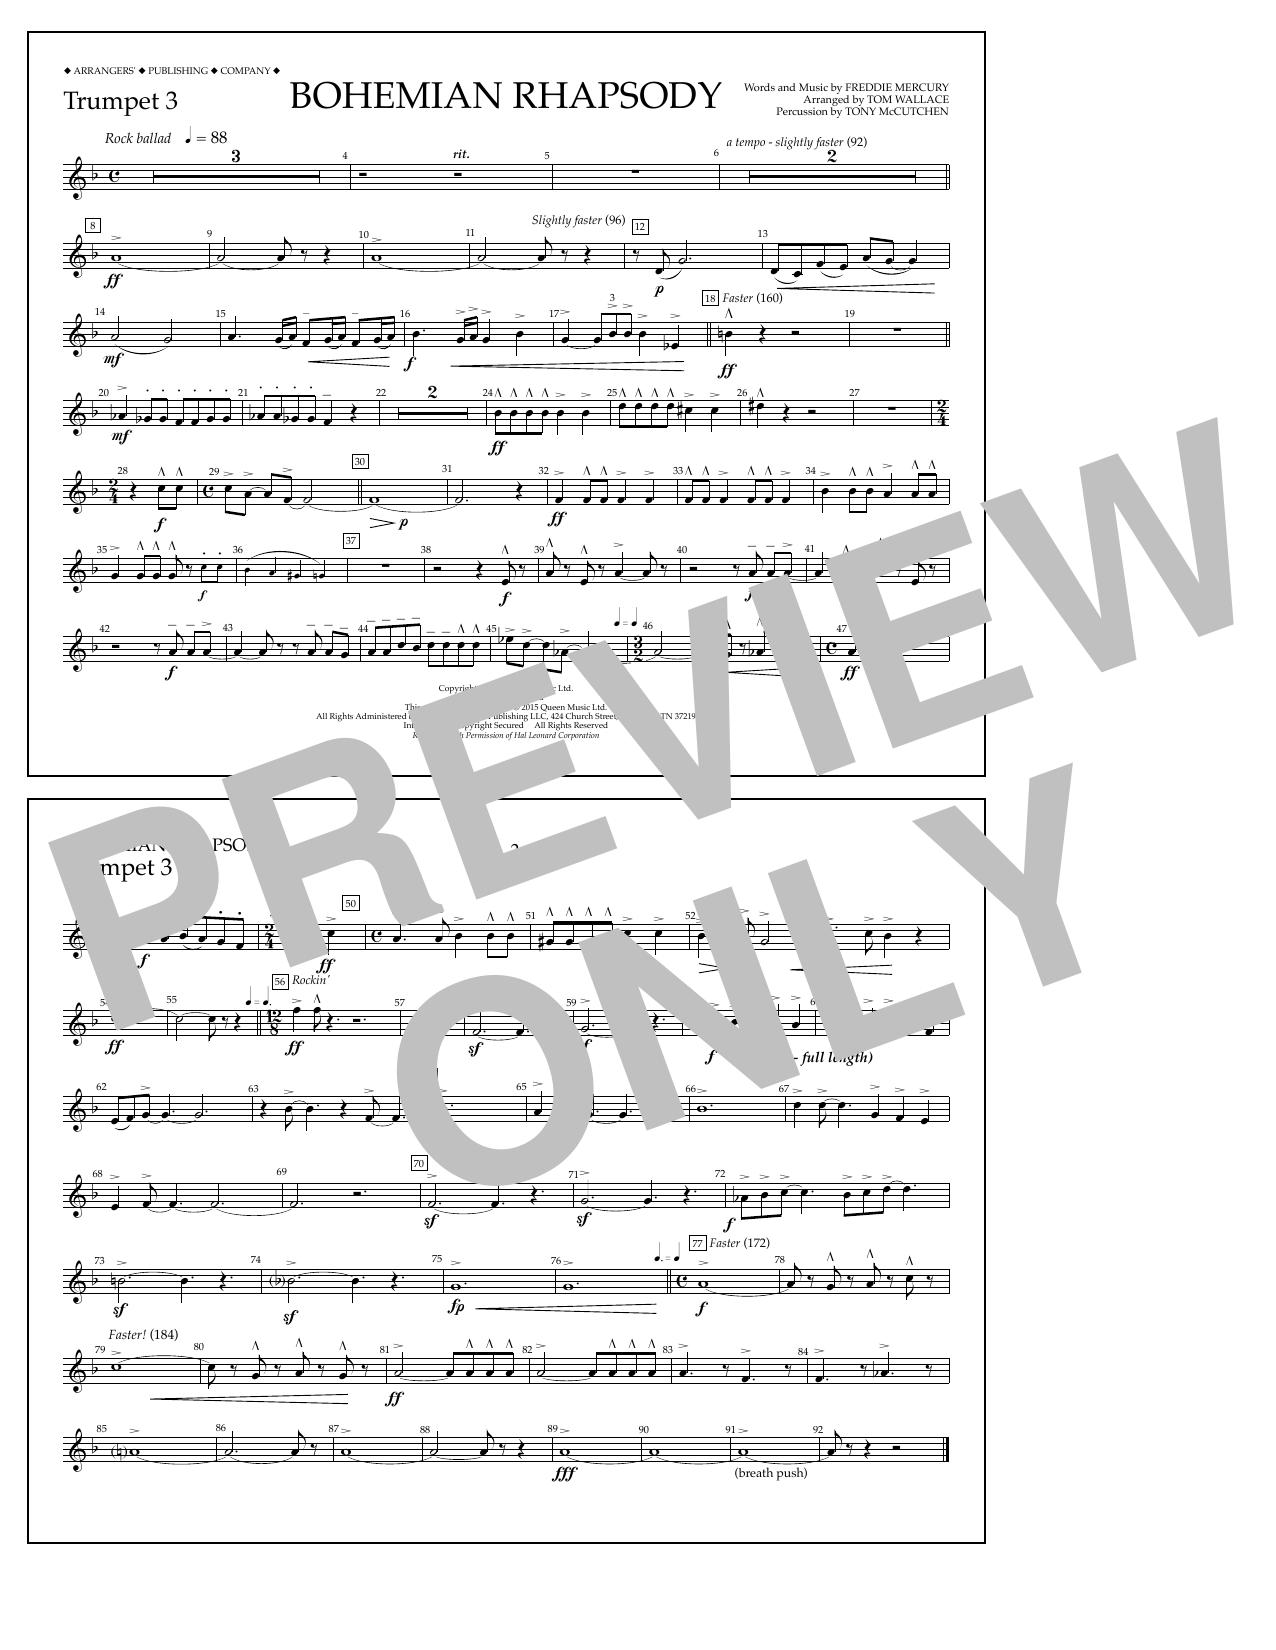 Bohemian Rhapsody - Trumpet 3 (Marching Band)